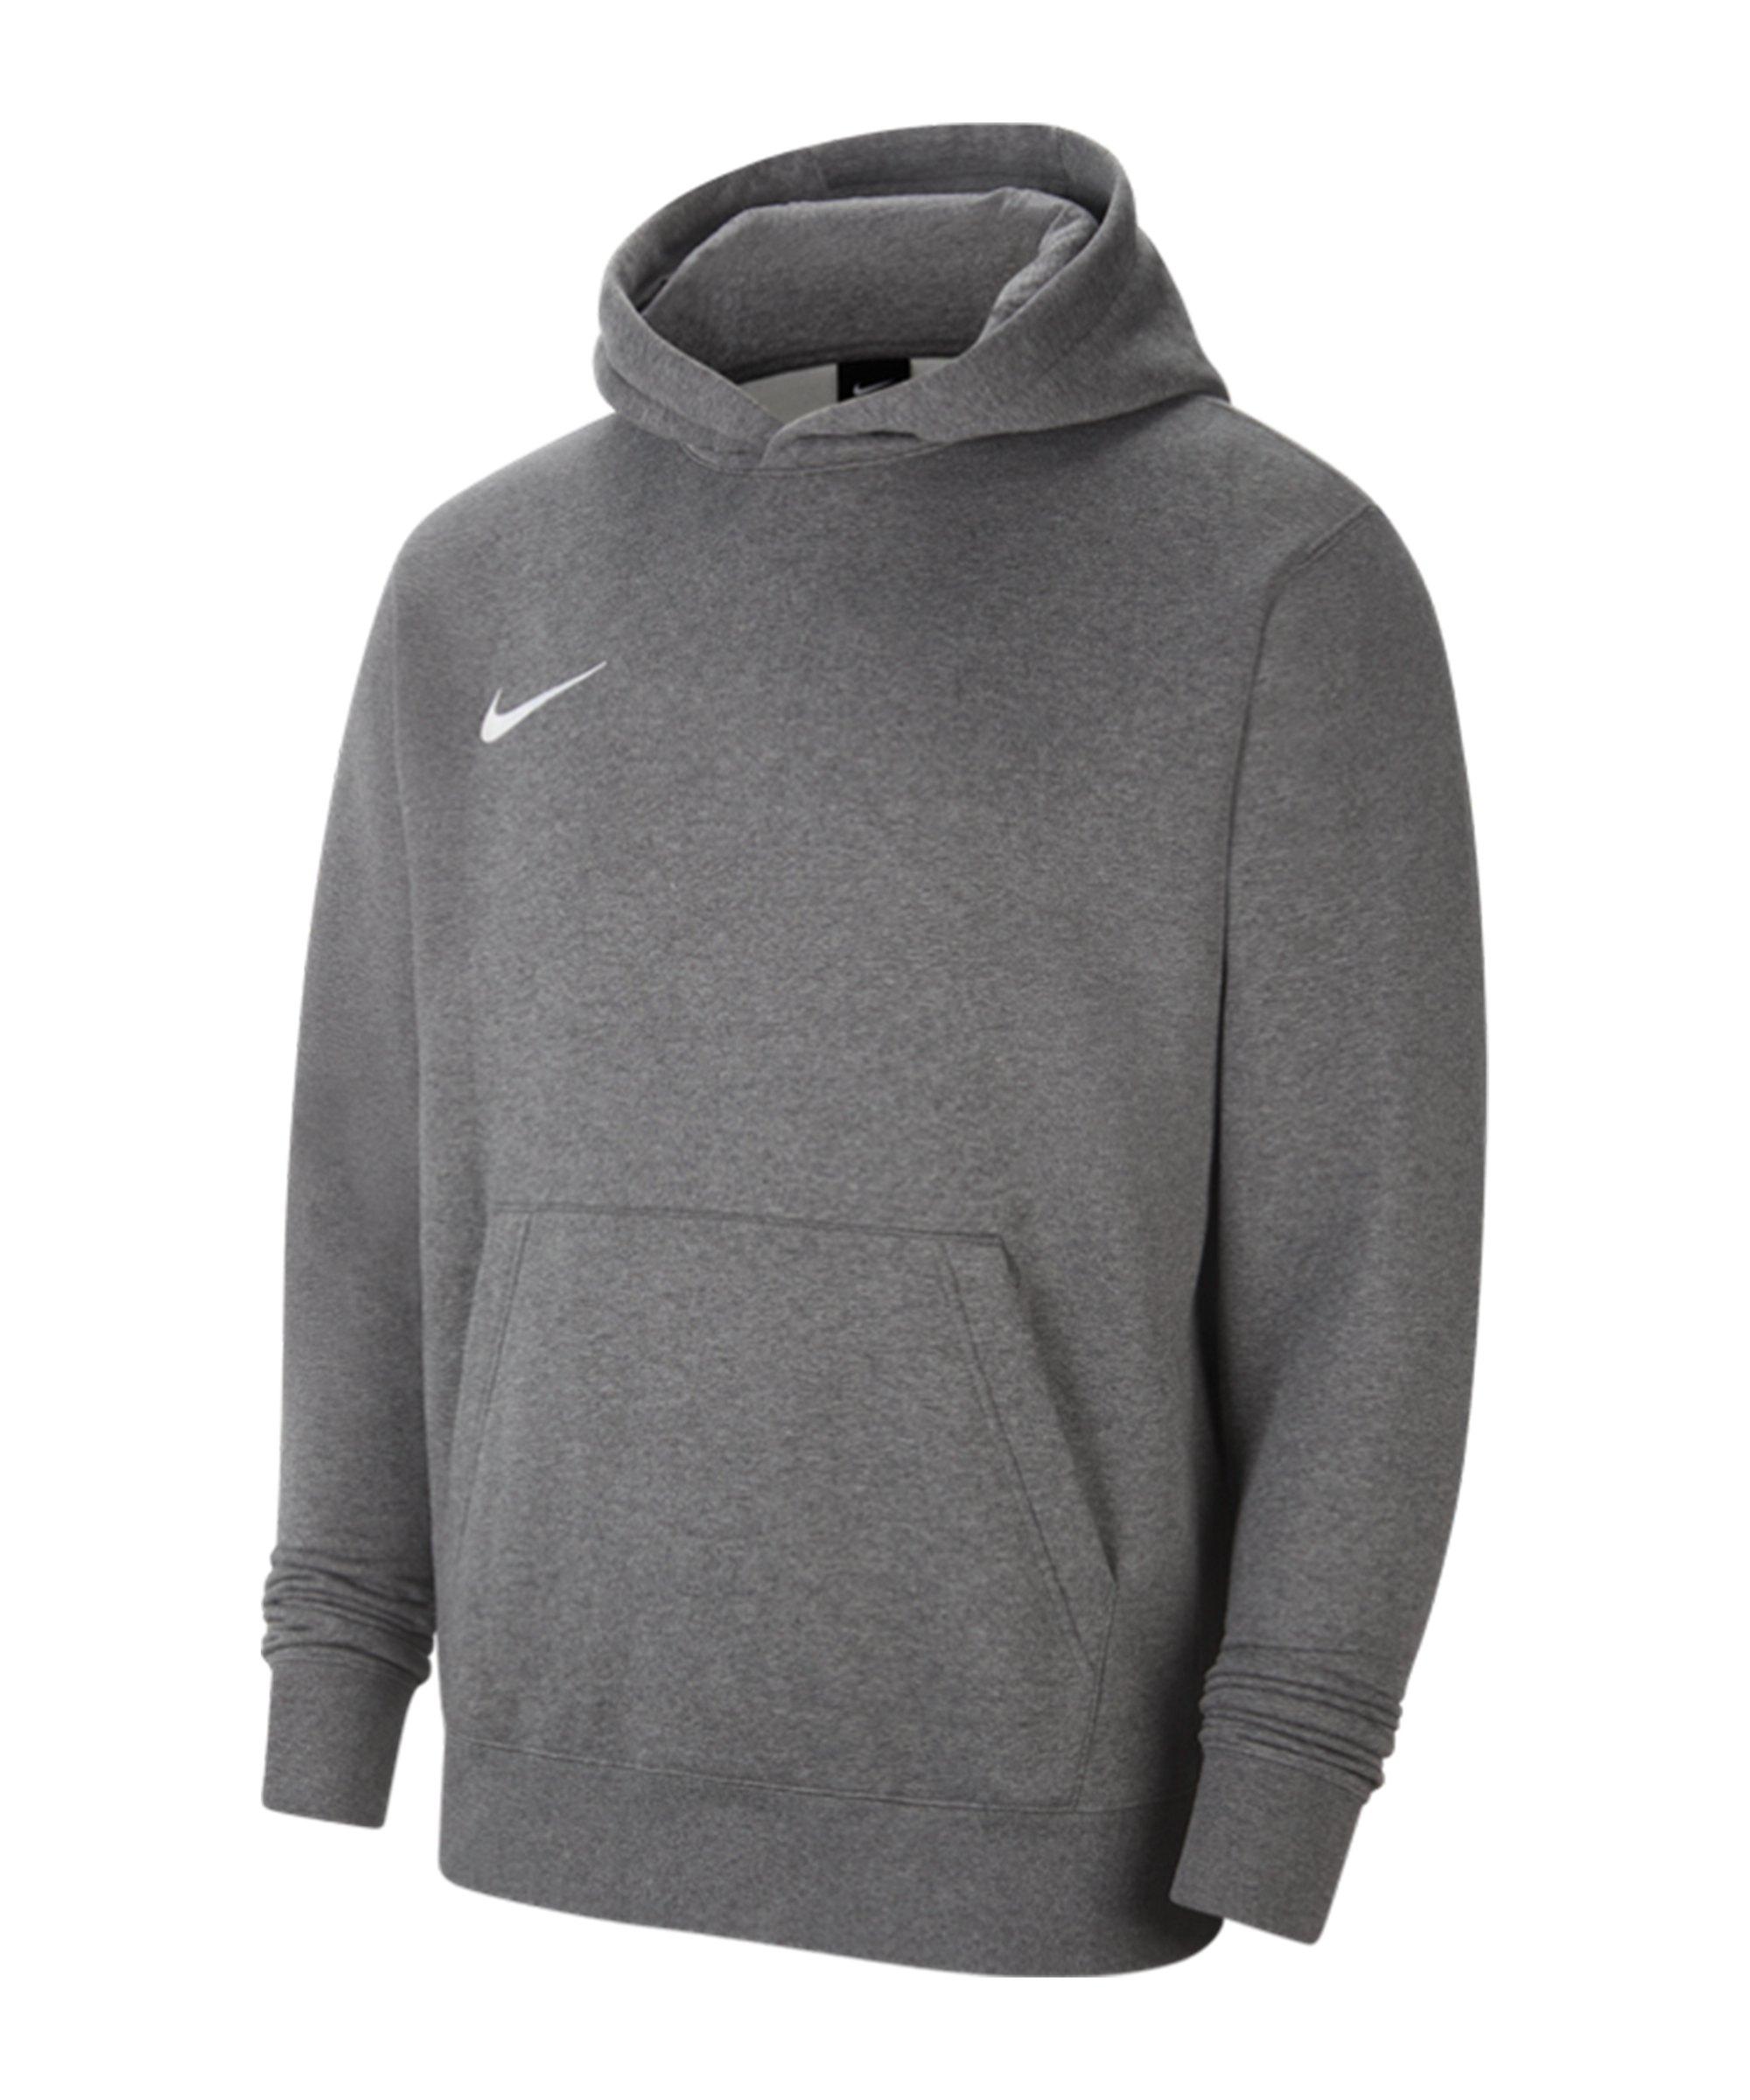 Nike Park 20 Fleece Hoody Kids Grau Weiss F071 - grau